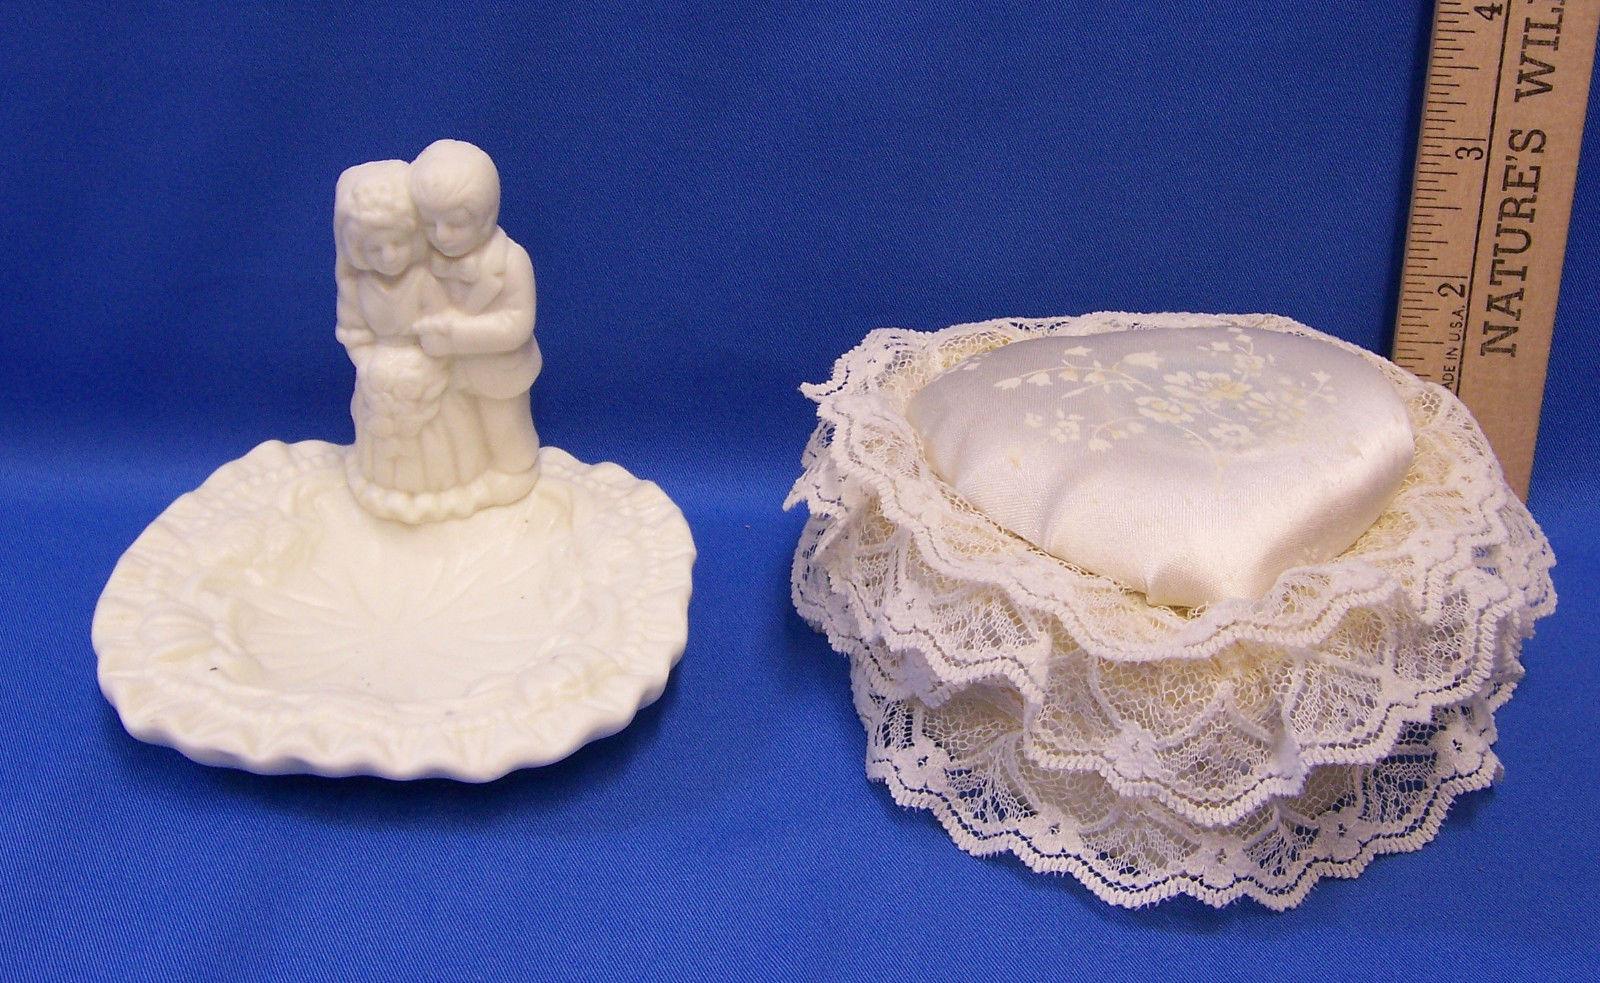 Jade Wedding Couple Ceramic Trinket Dish & Heart Shaped Musical Trinket Box